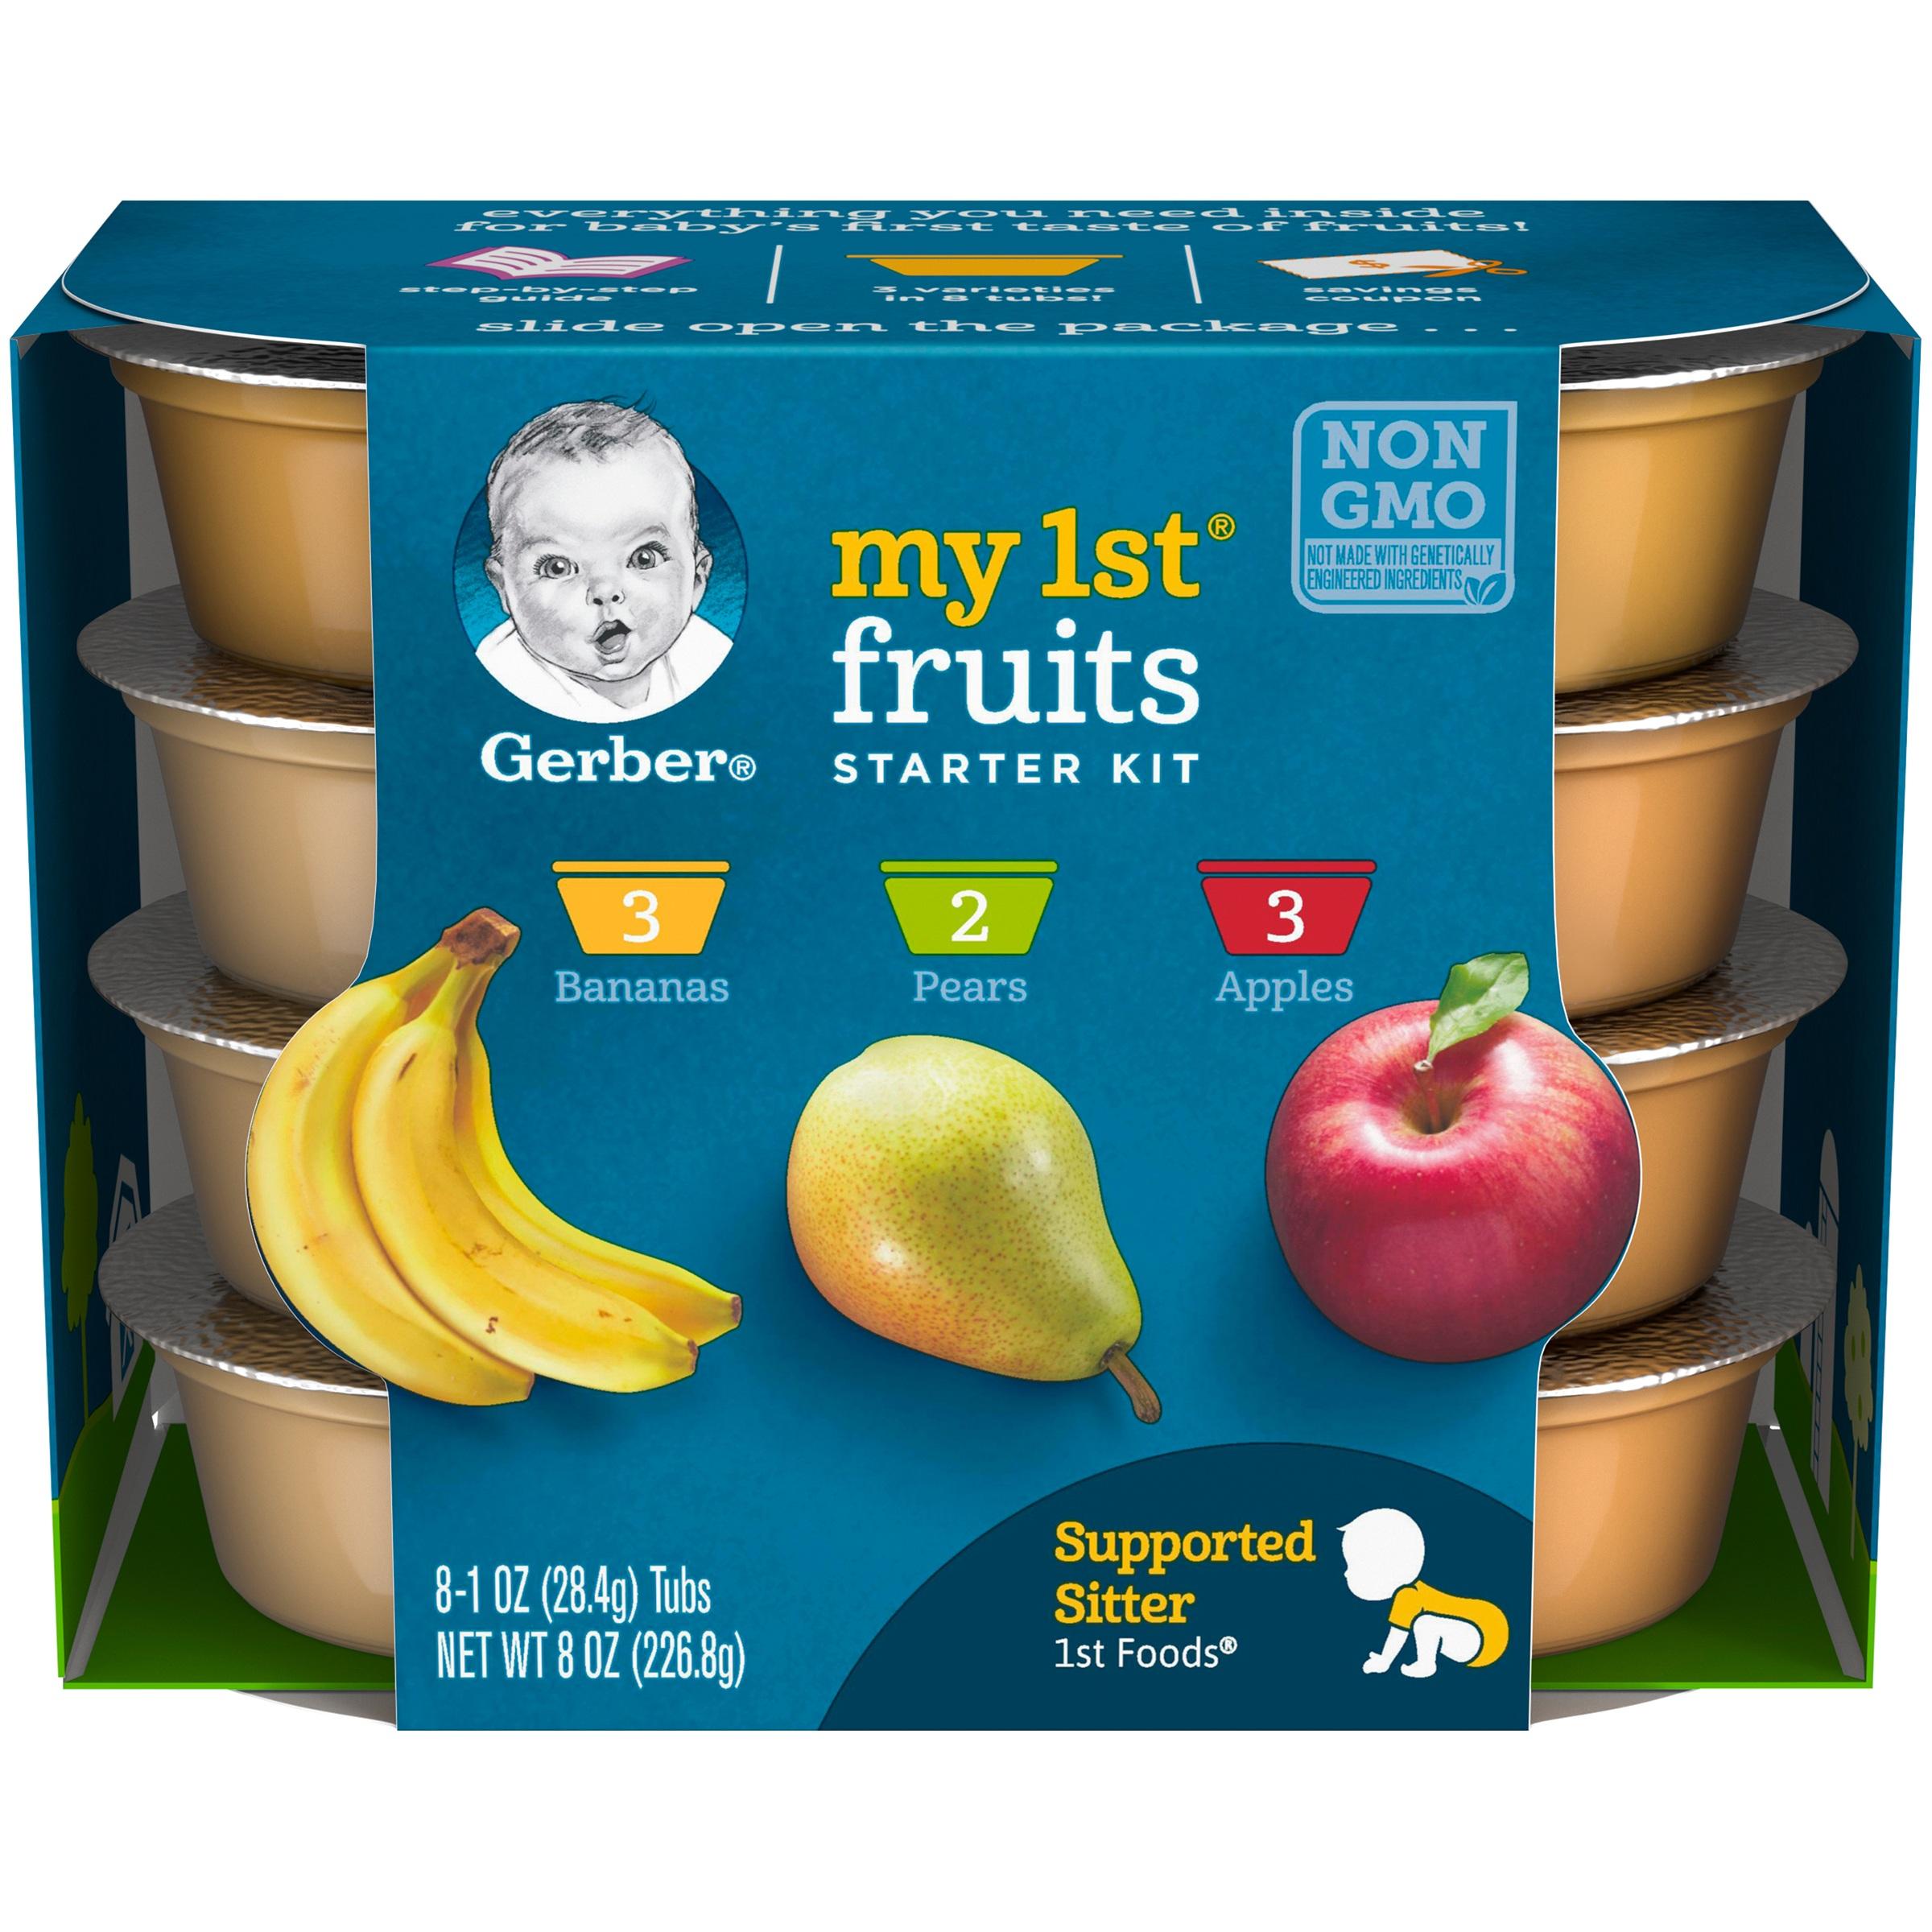 Gerber My 1st Fruits Baby Food Starter Kit, 1 oz. Tubs, 8 Count